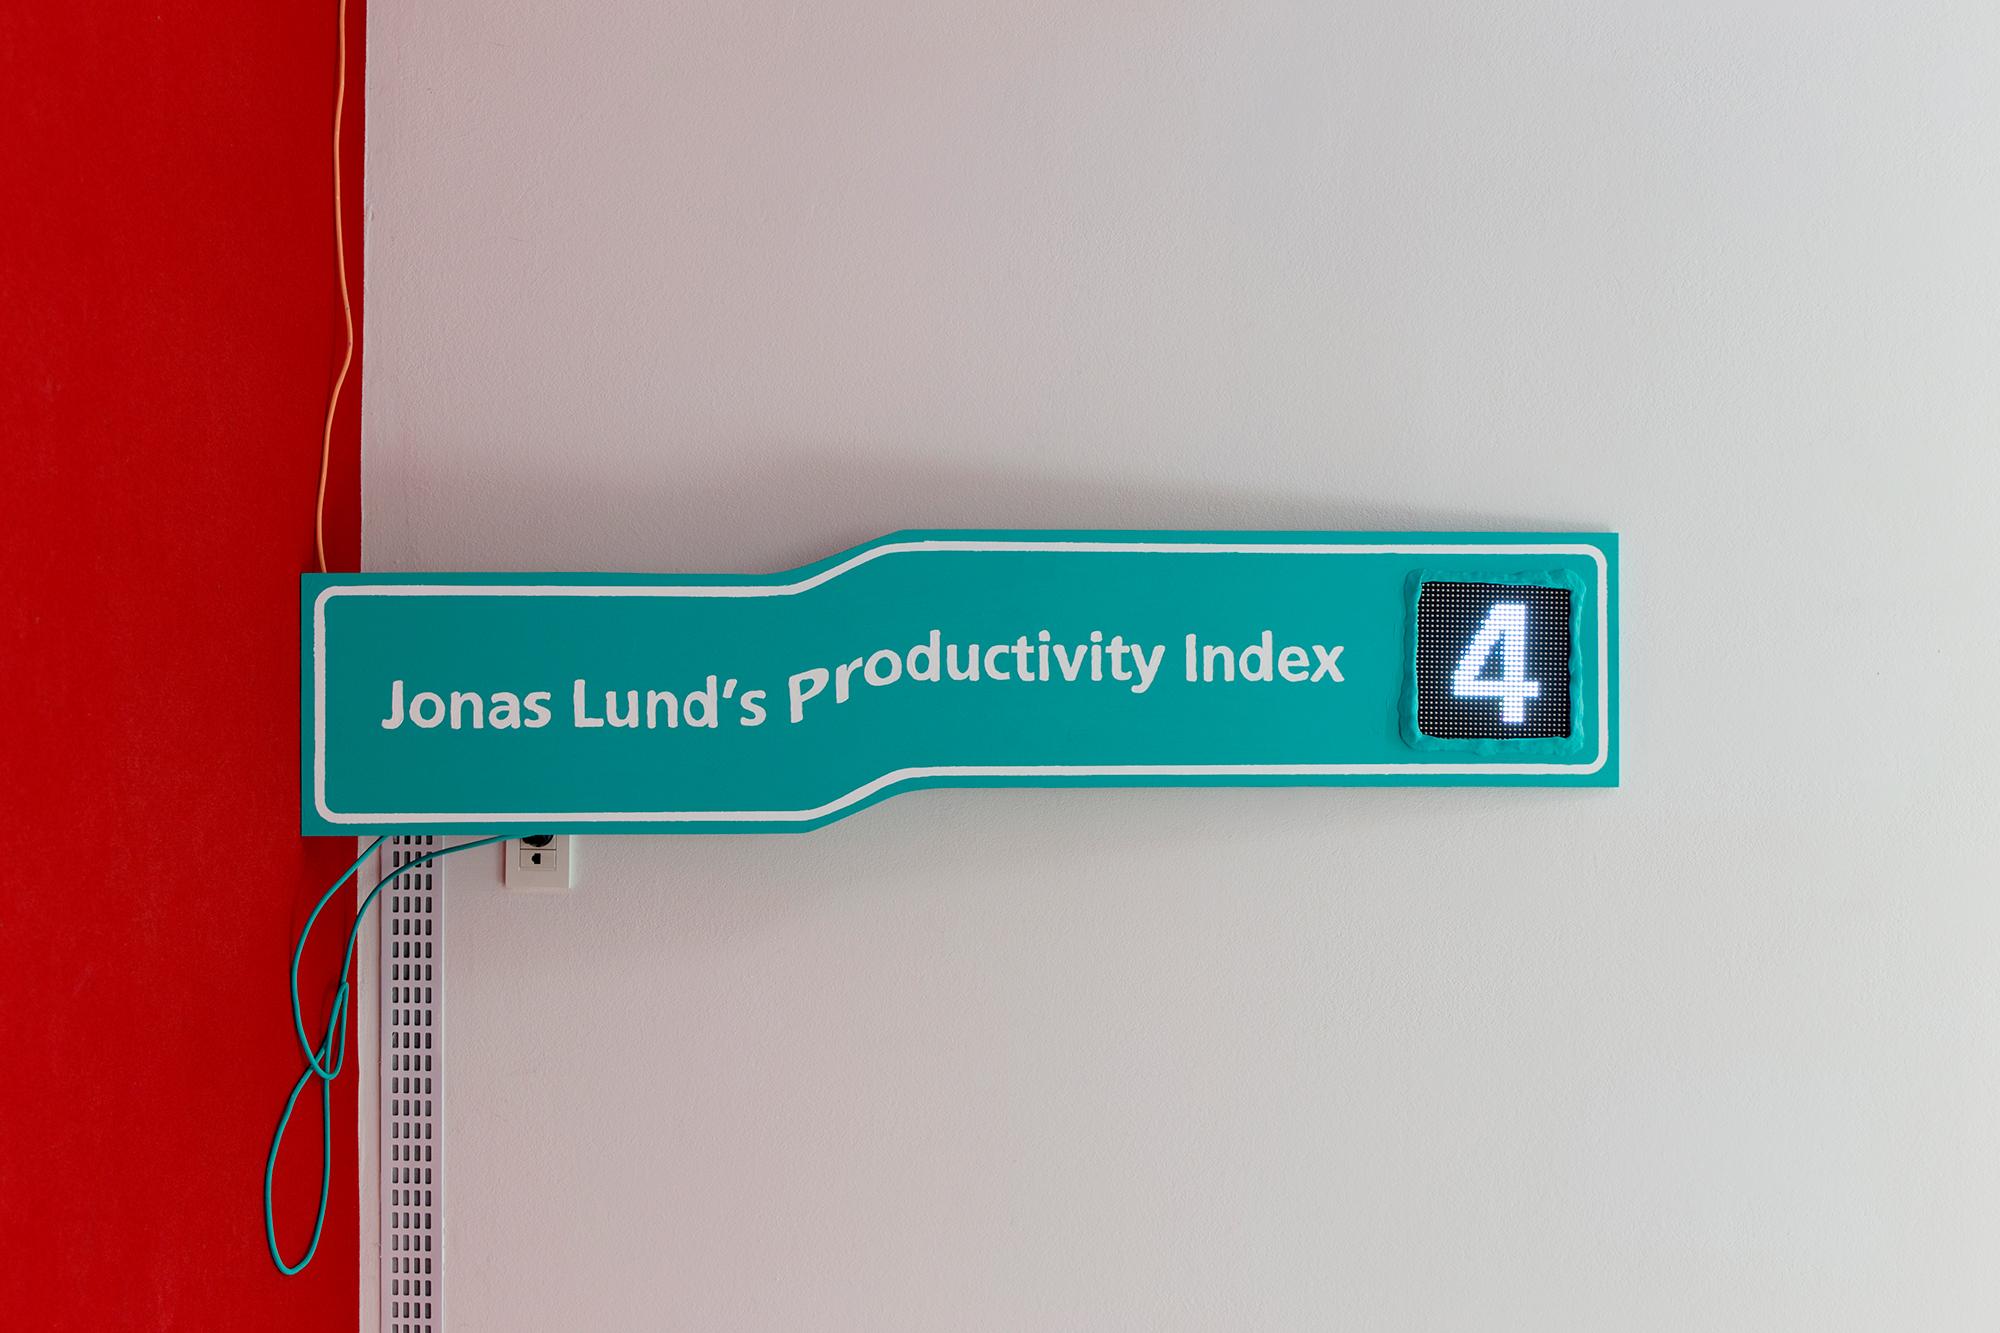 Jonas Lund Jonas Lund's Productivity Index